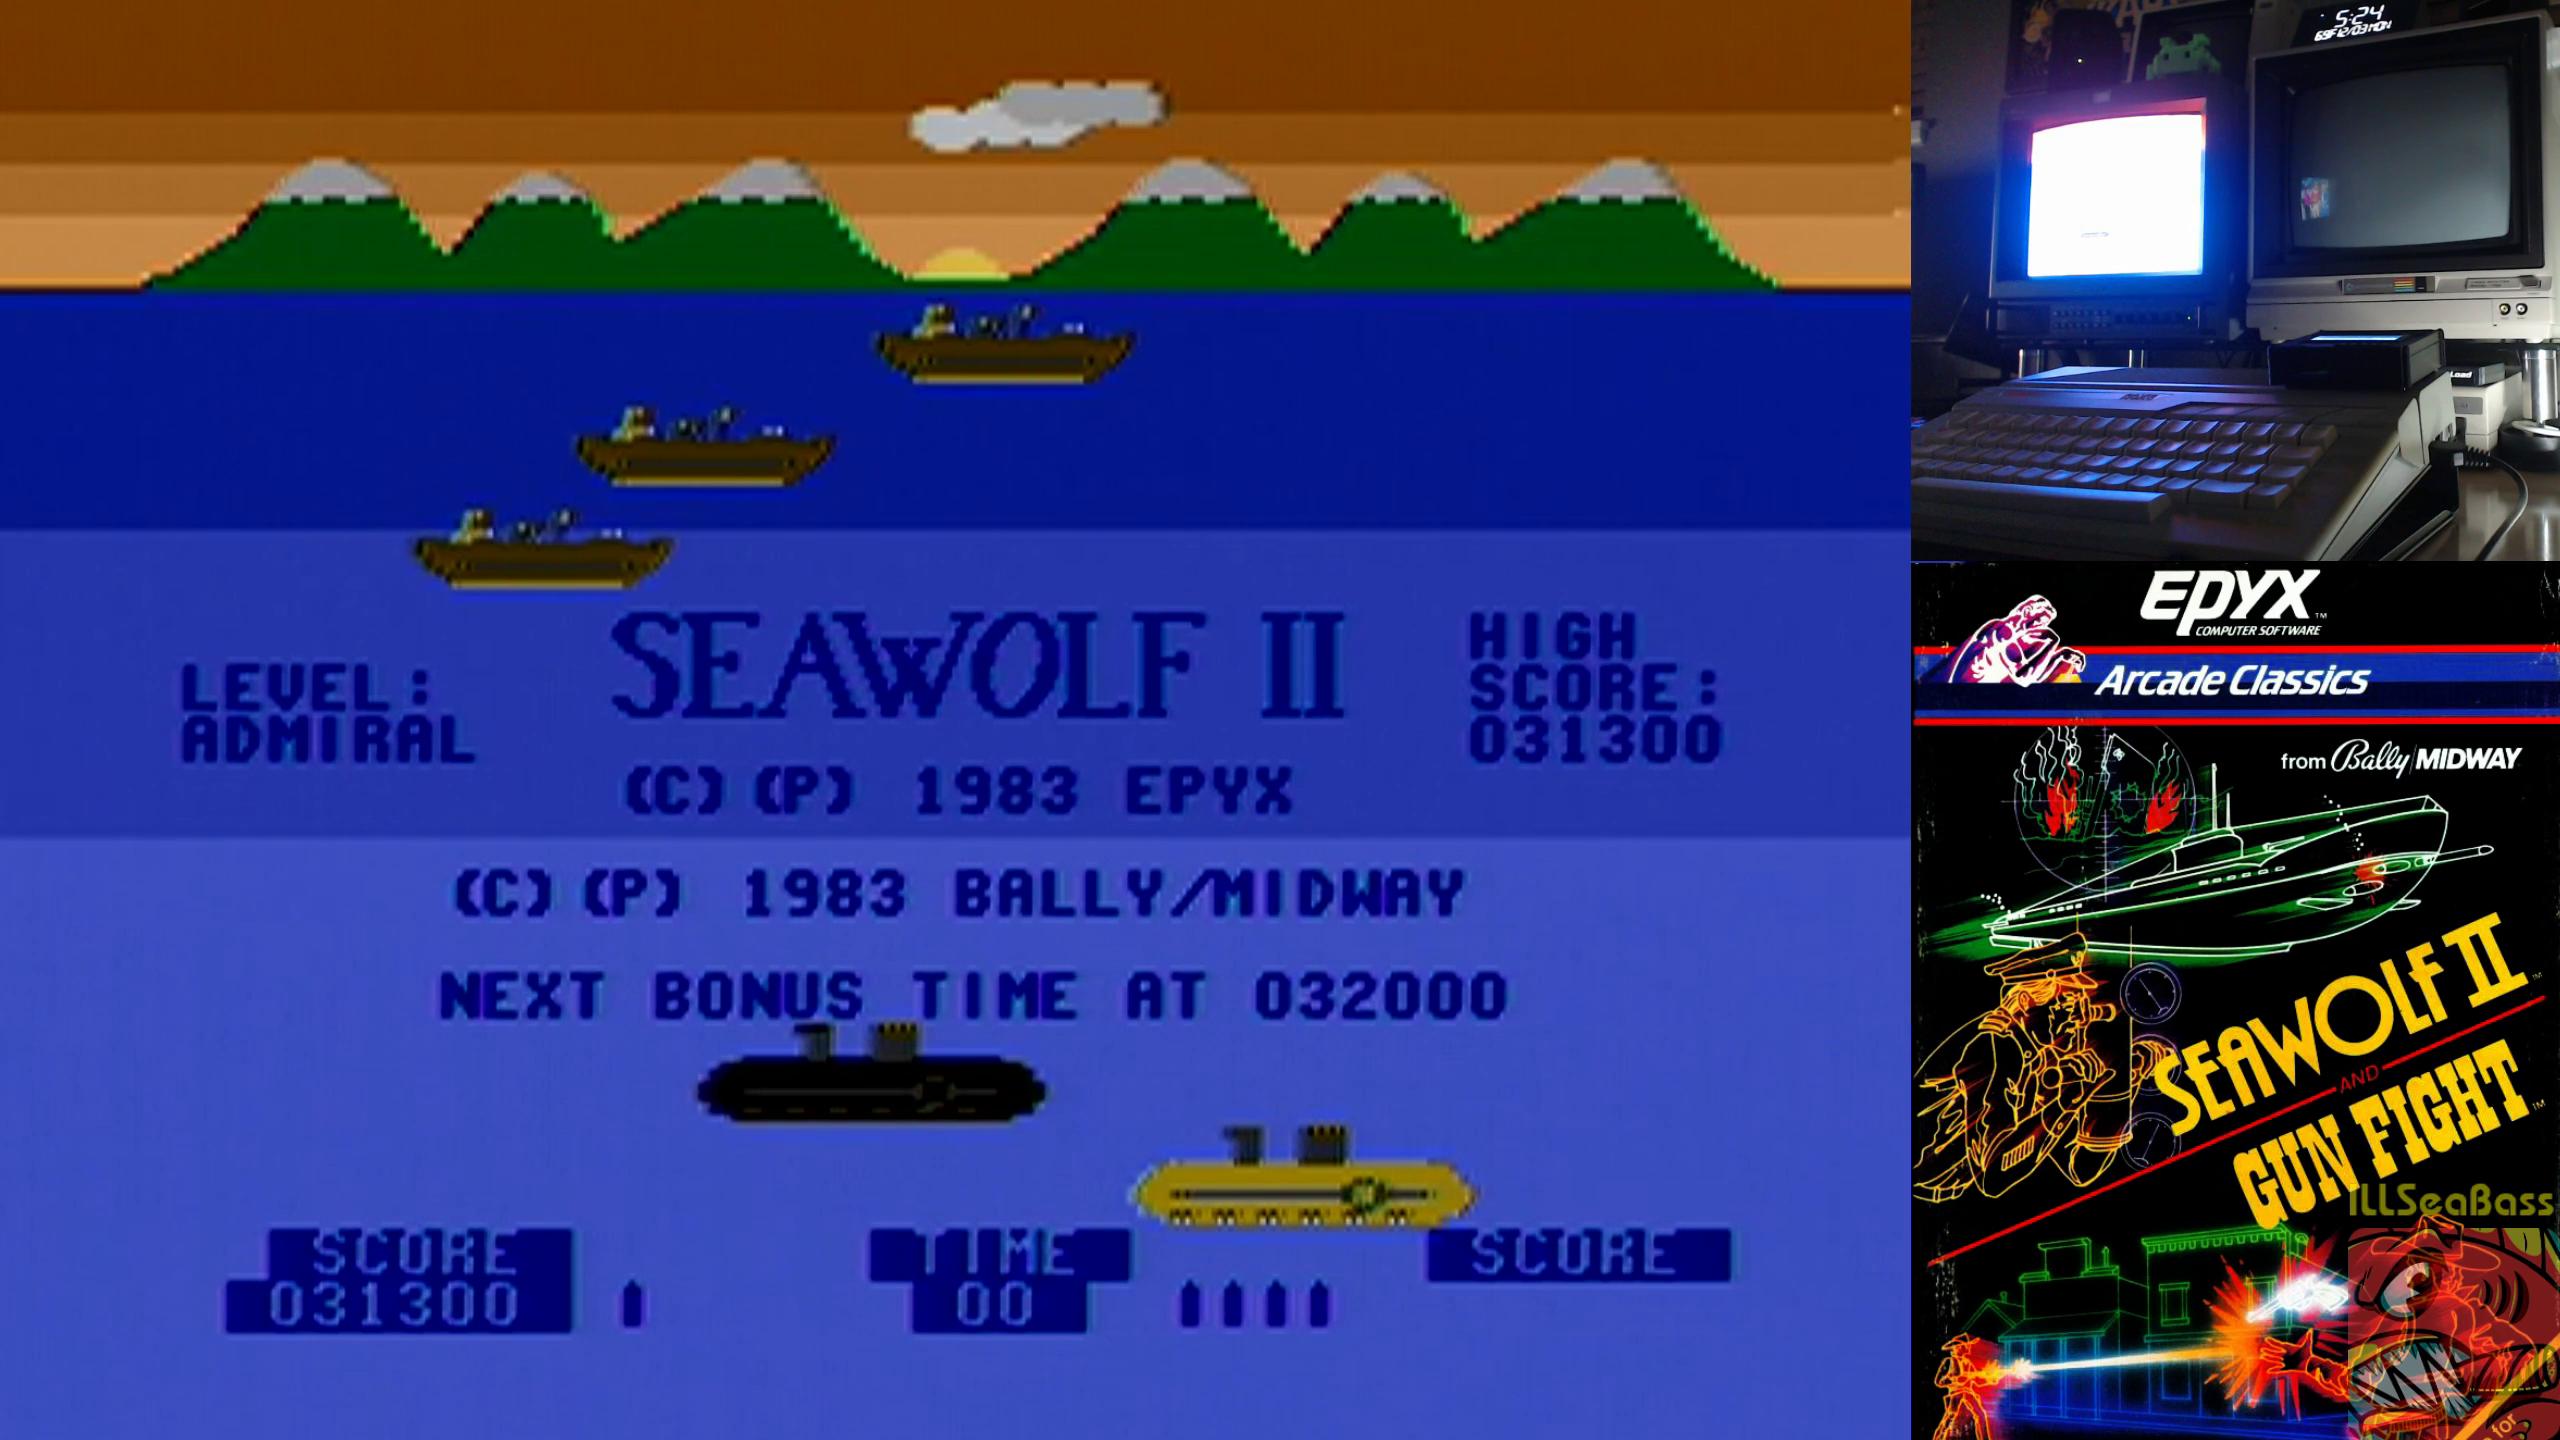 Seawolf II 31,300 points